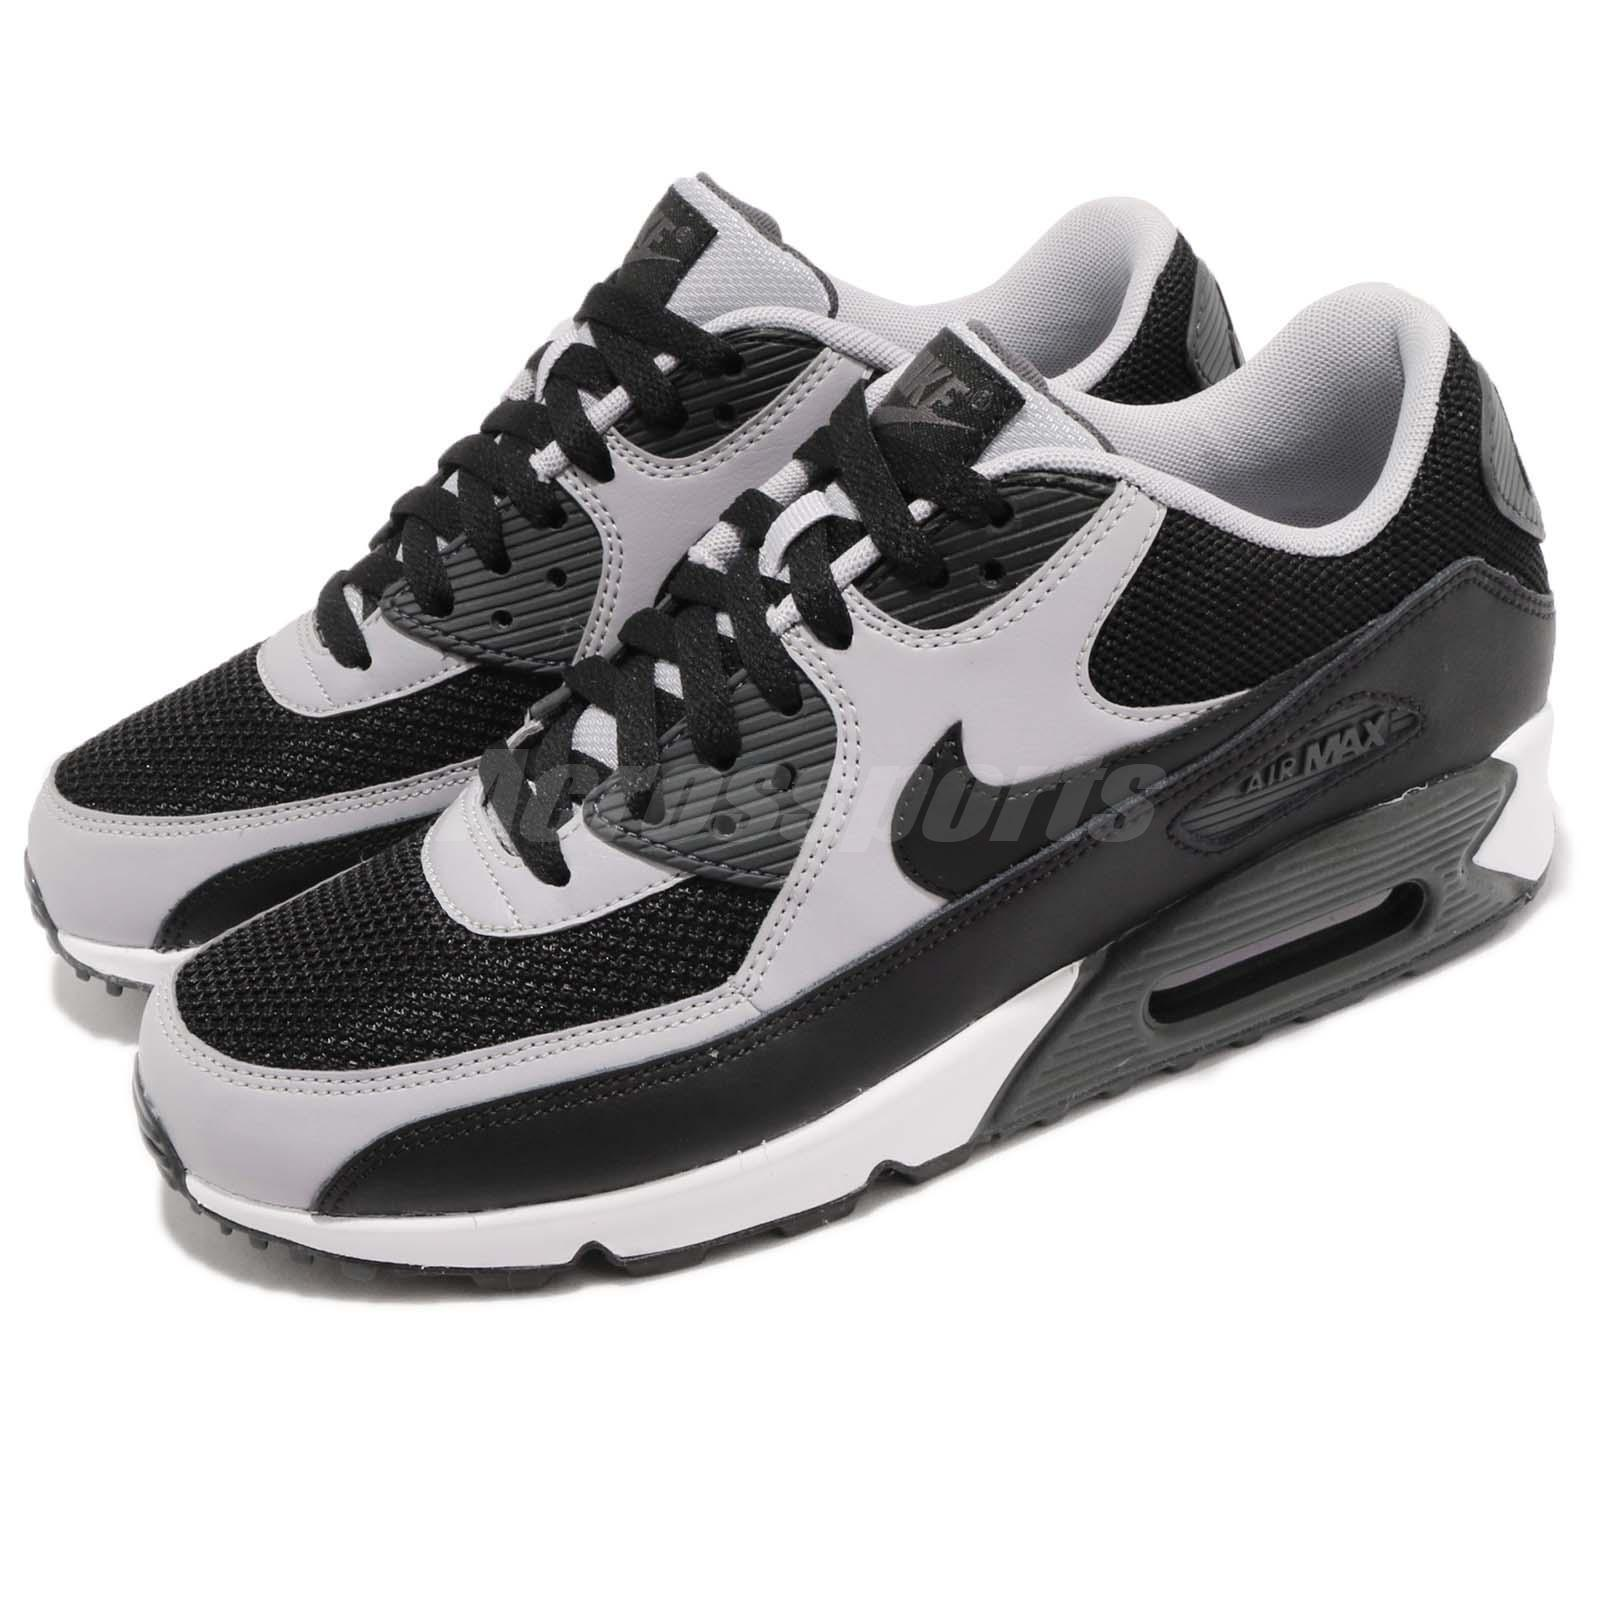 Nike Air Max 90 Hommes Essential Noir Wolf Gris Hommes 90 Running Chaussures 537384-053 4b6dcf